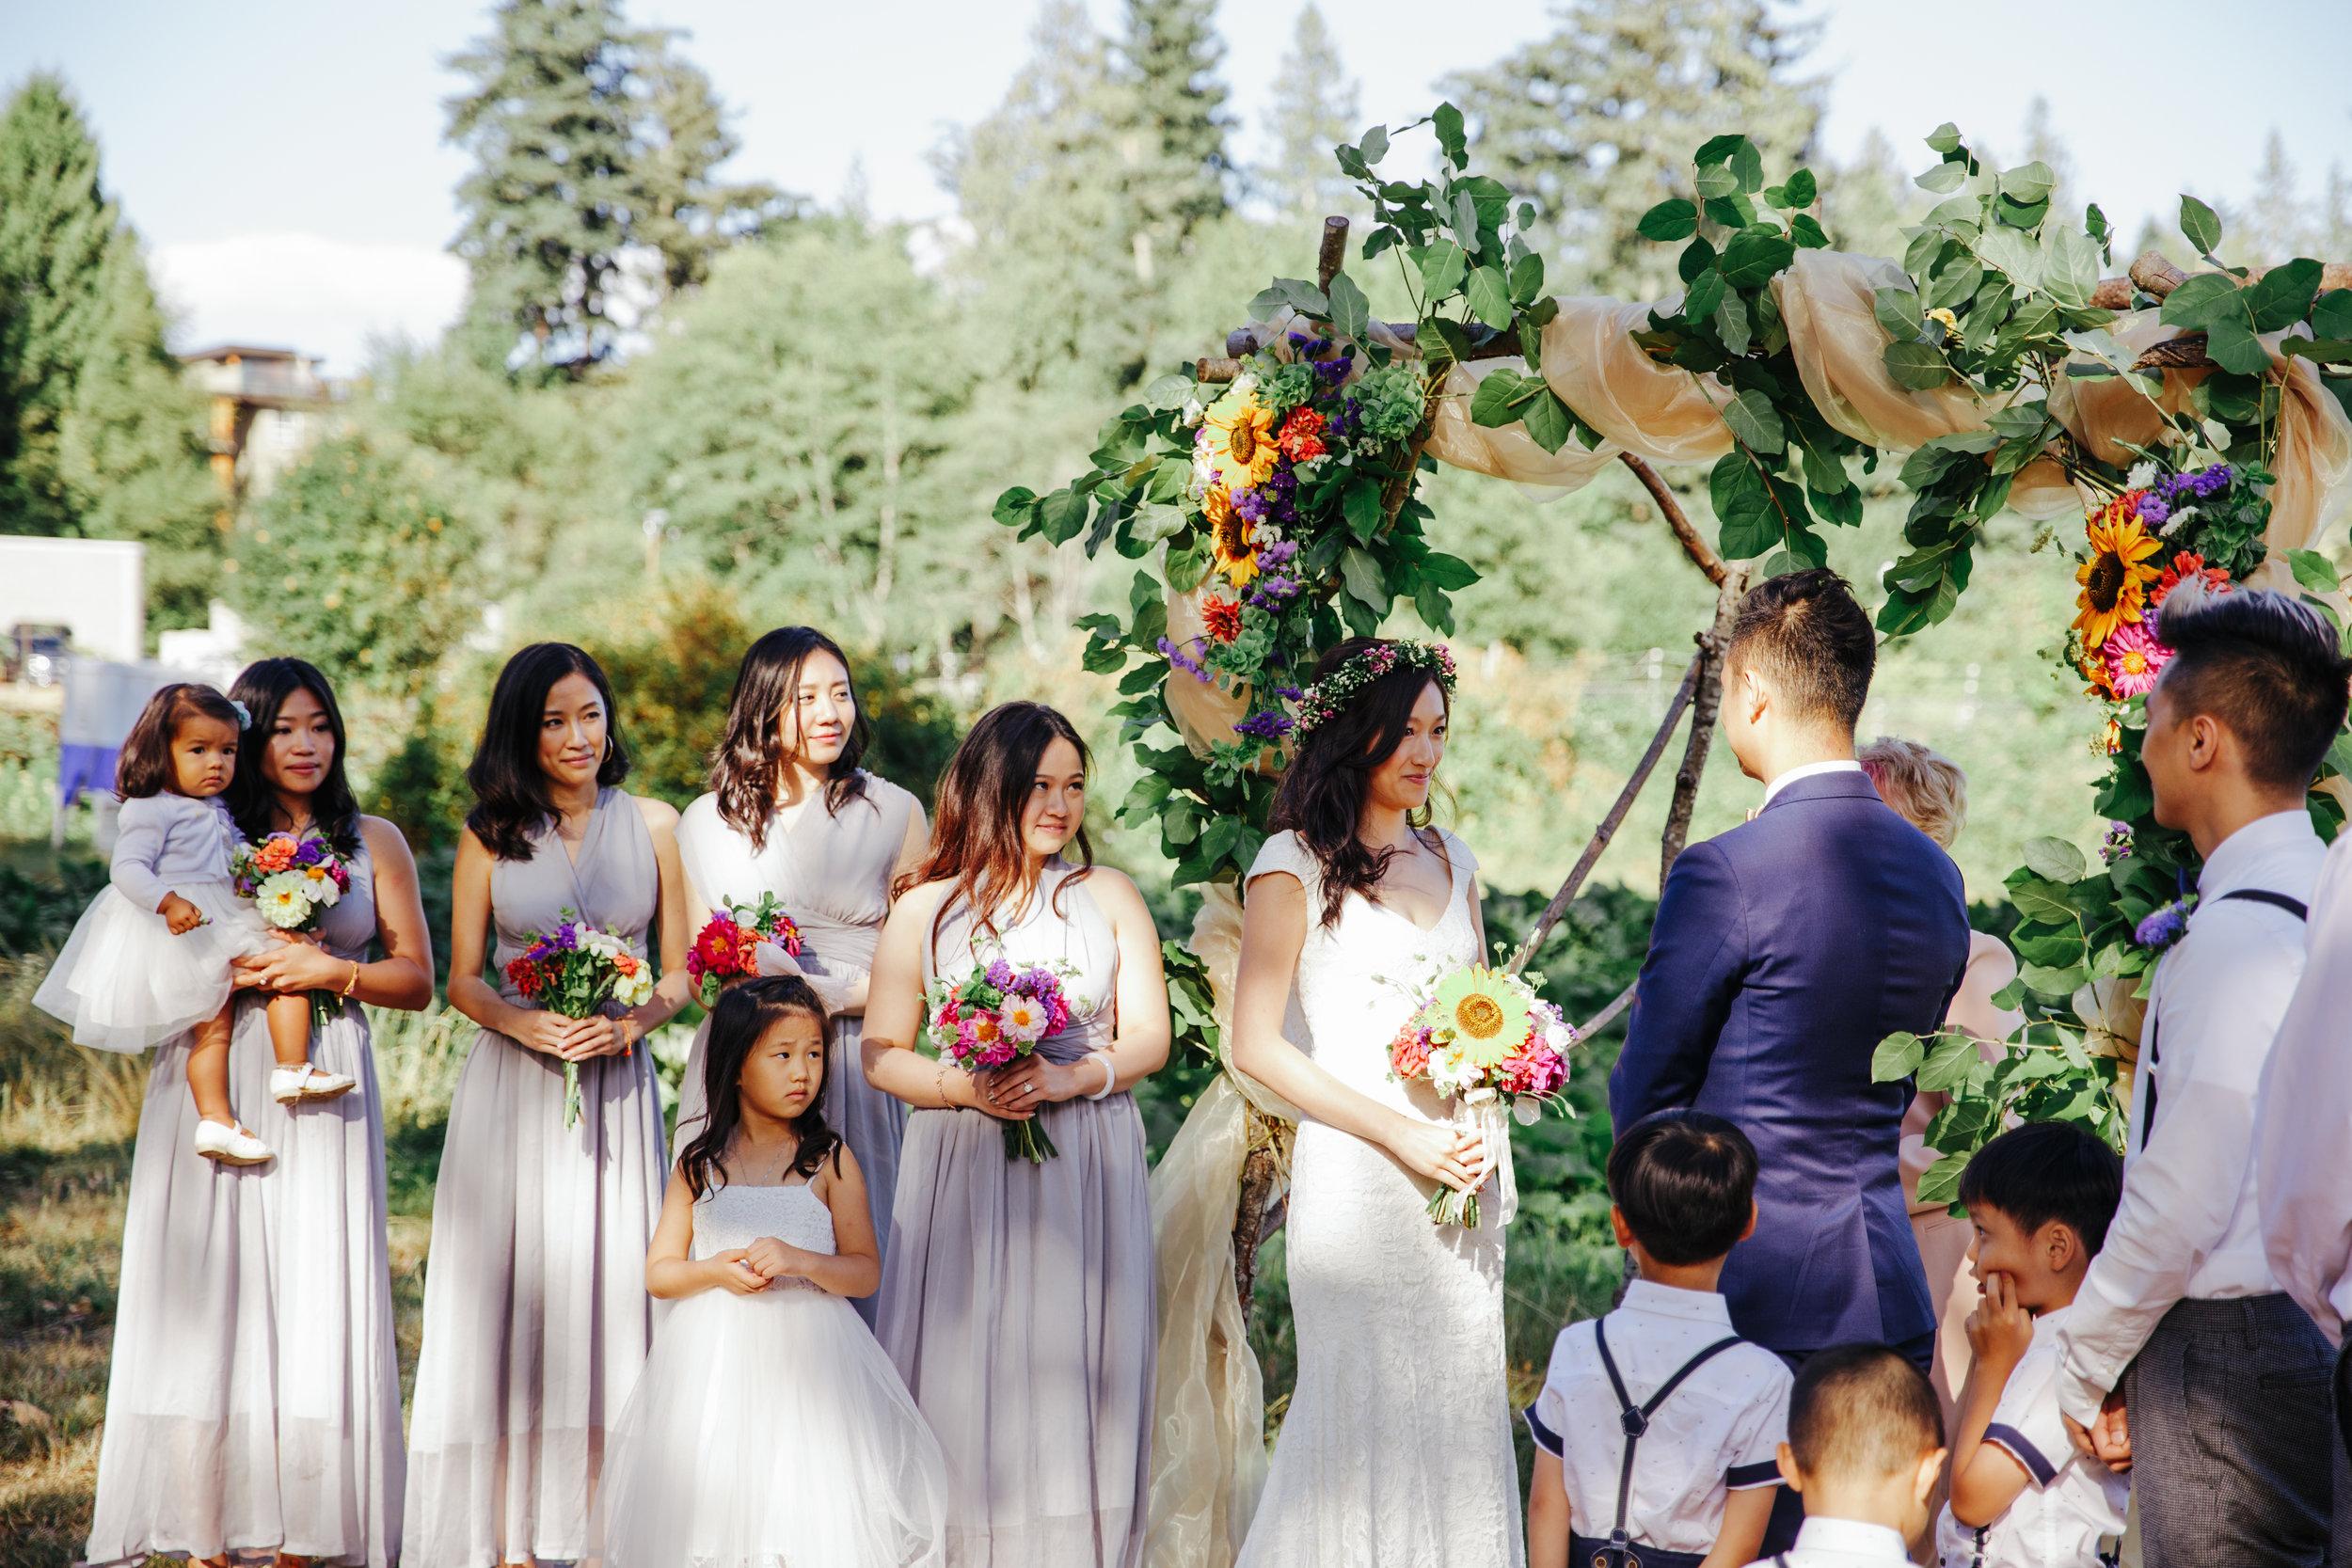 herastudios_wedding_bella_james_hera_selects-81.jpg